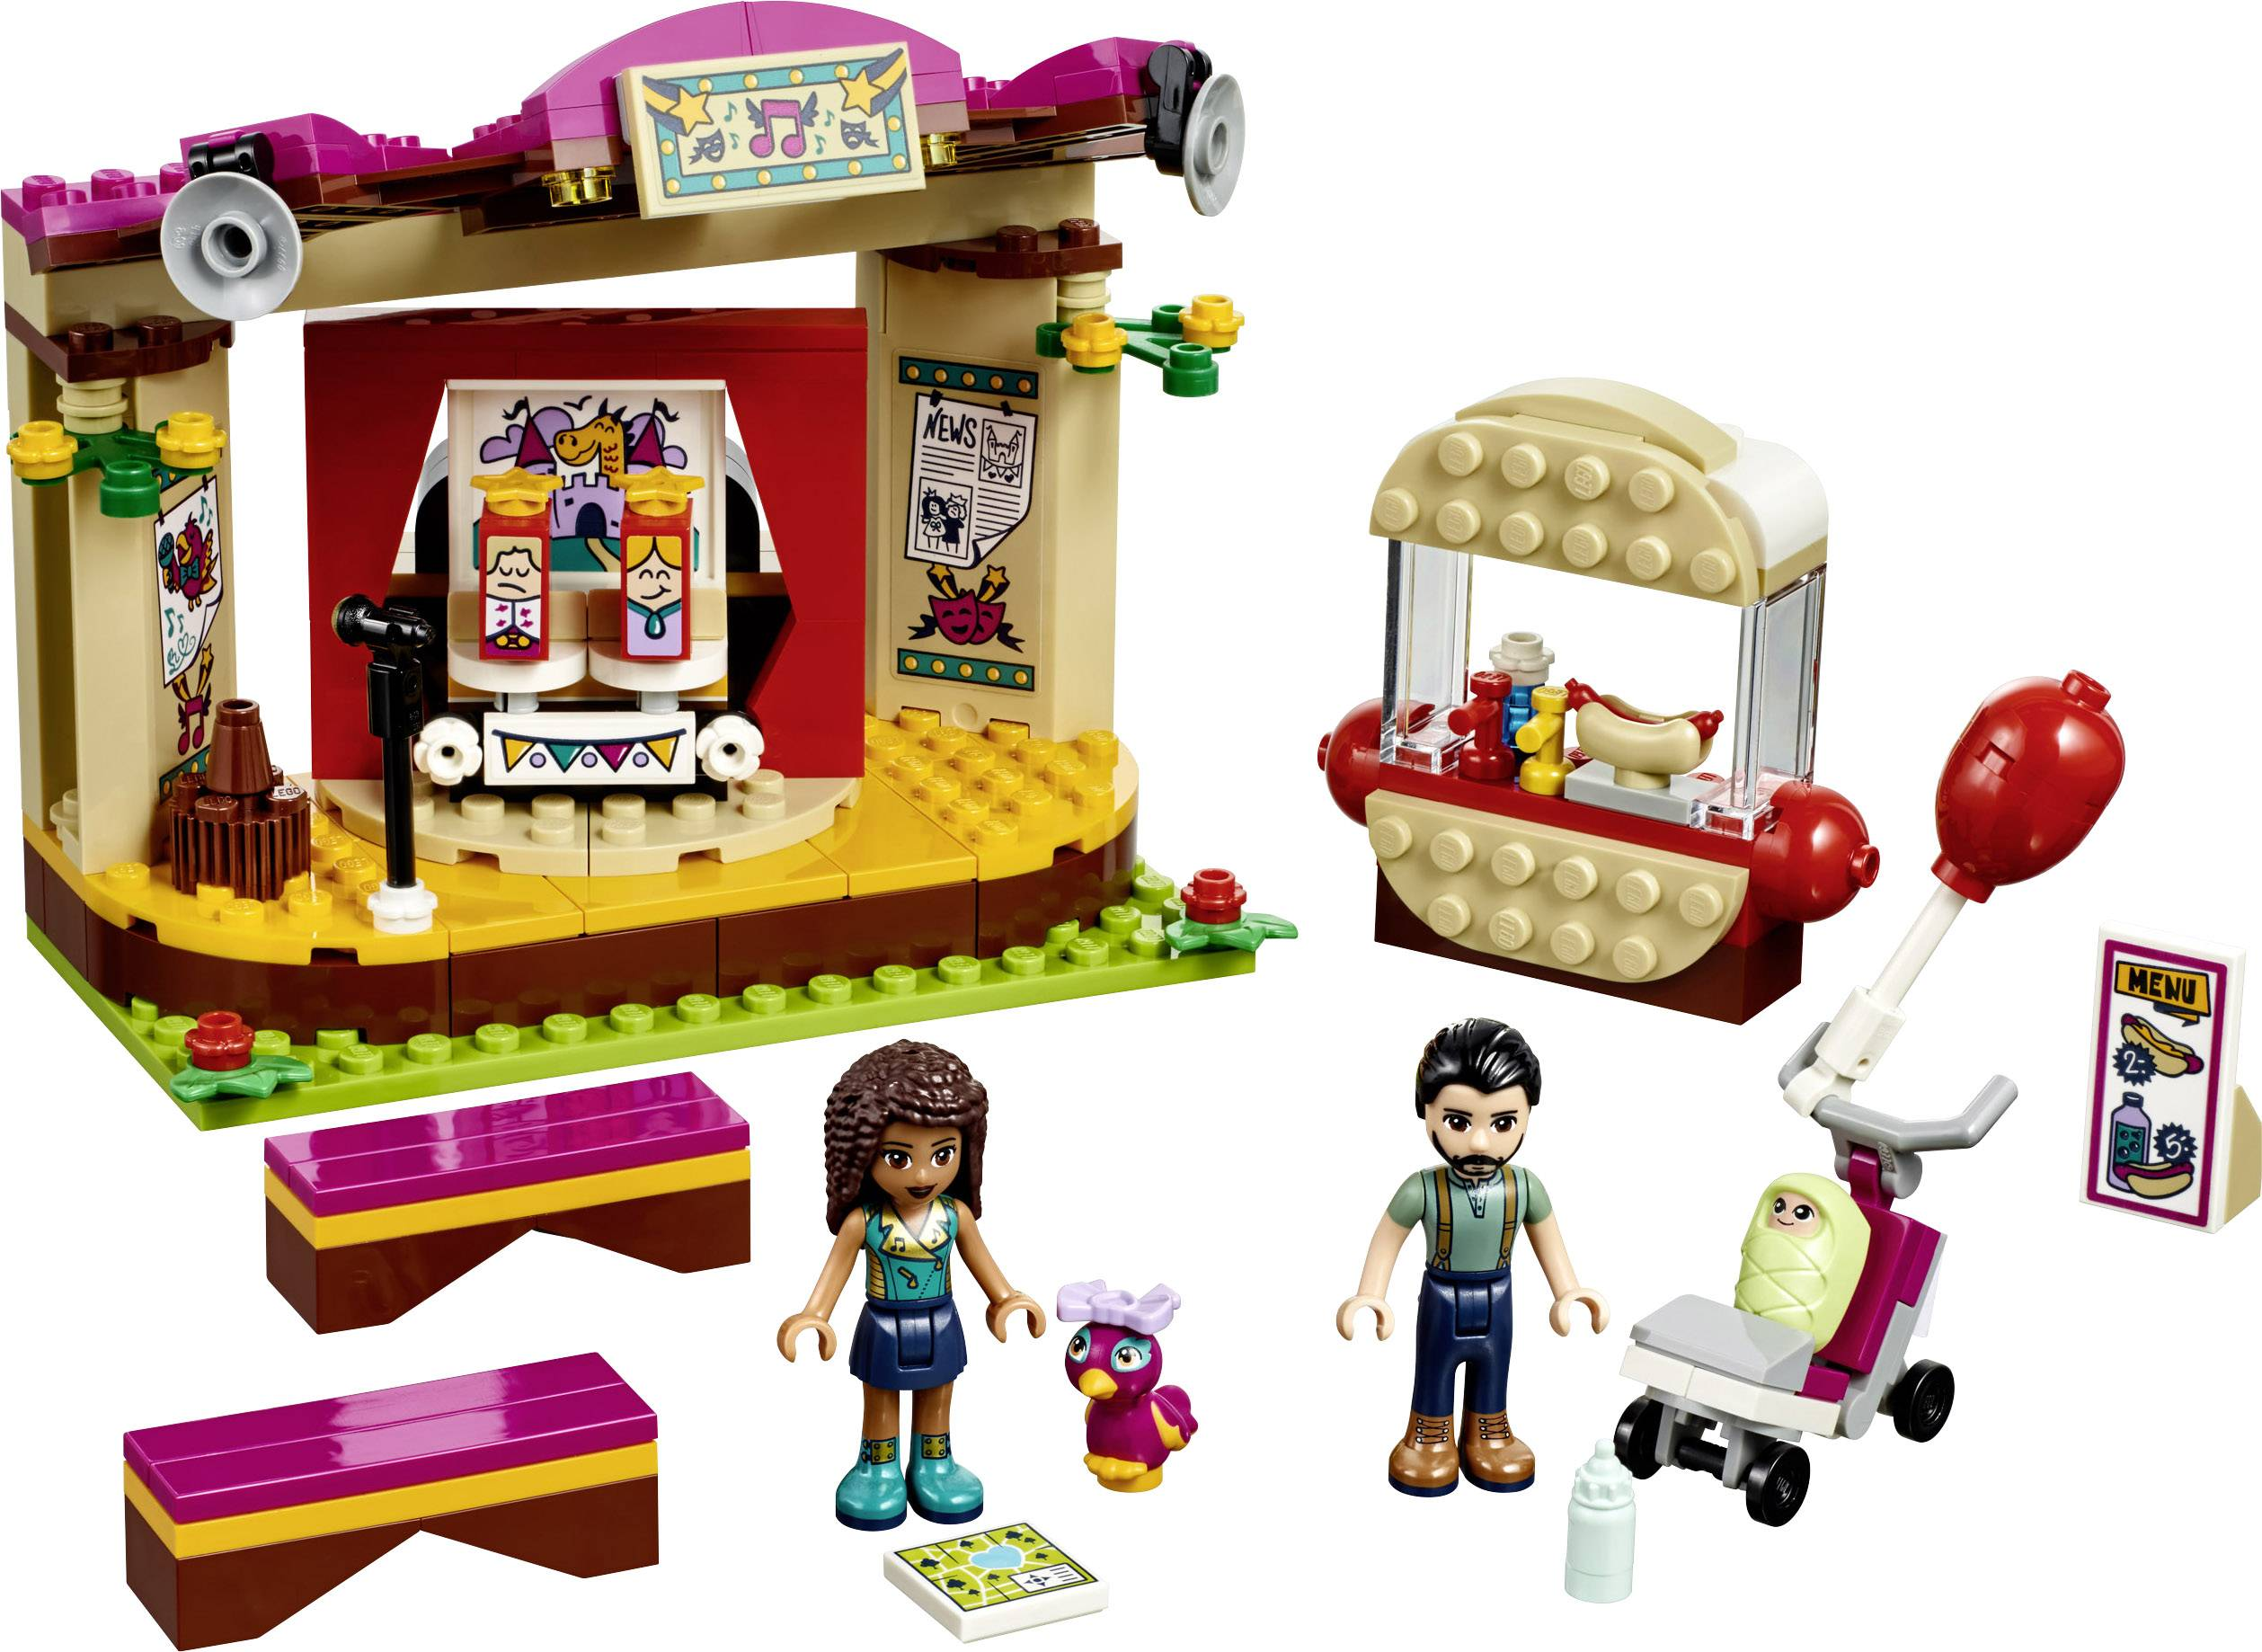 New 41334 Lego Friends MiniFigure BABY DIANA